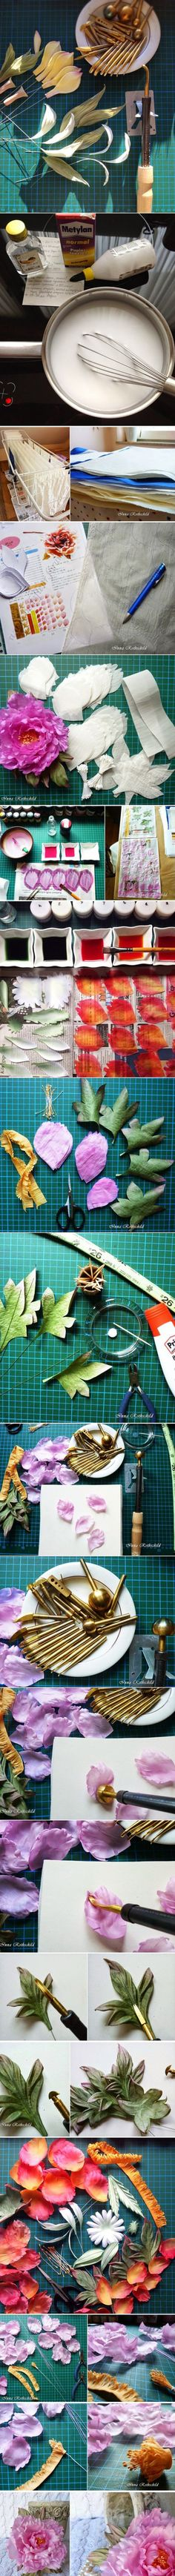 How to make a silk flower by Inna Rothschild